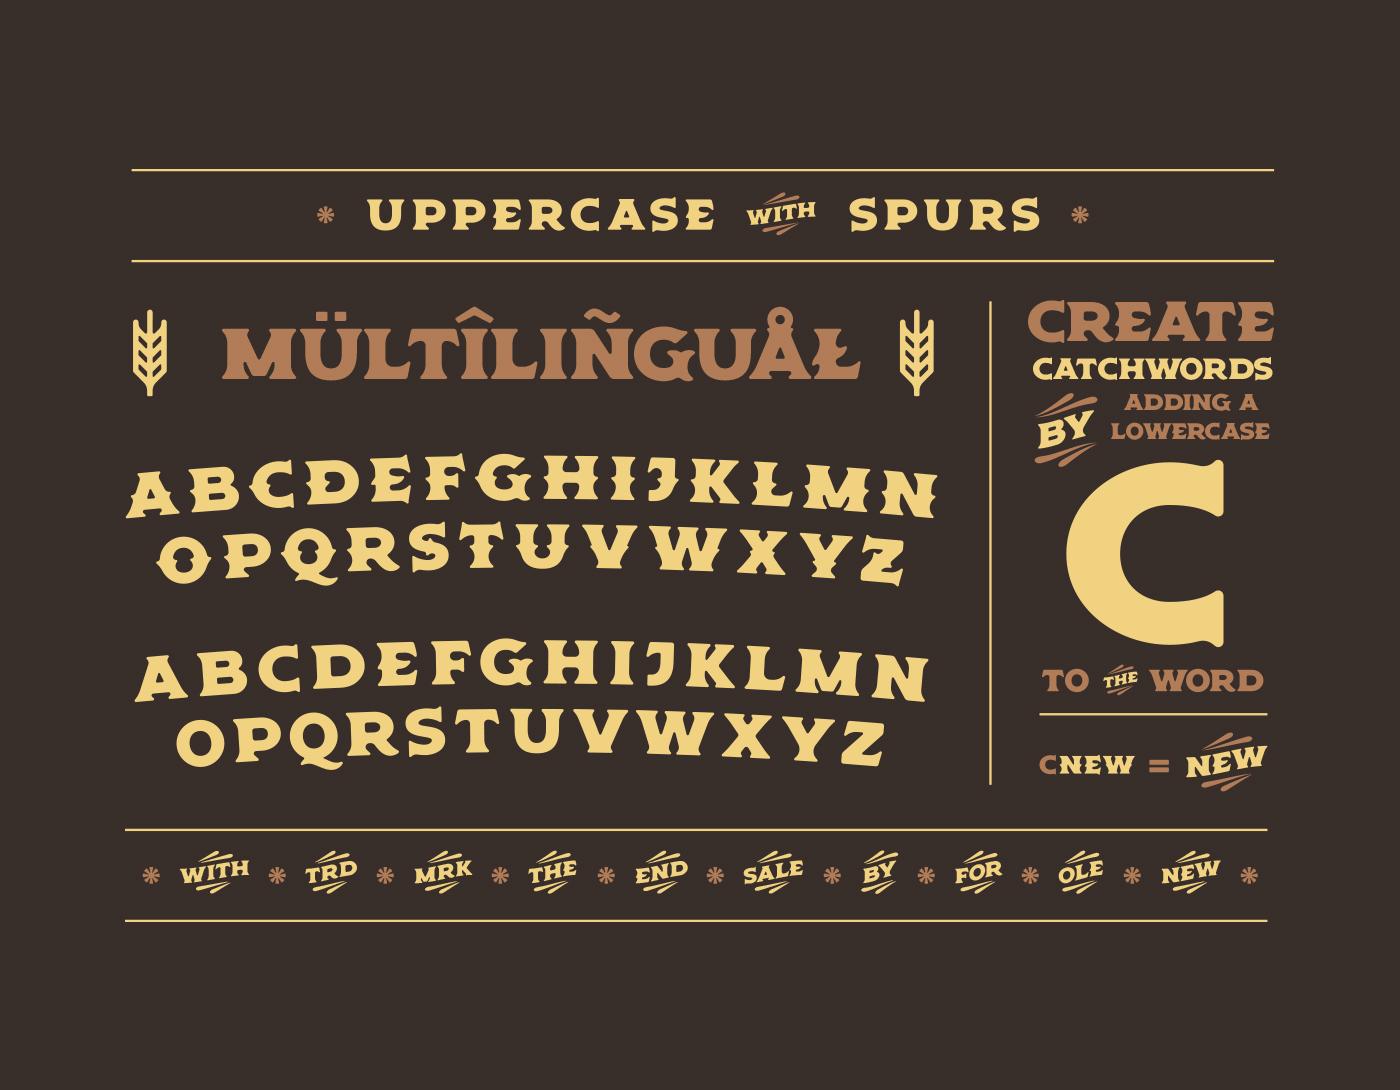 bold Display font fonts americana inked rough old Spirits liquor